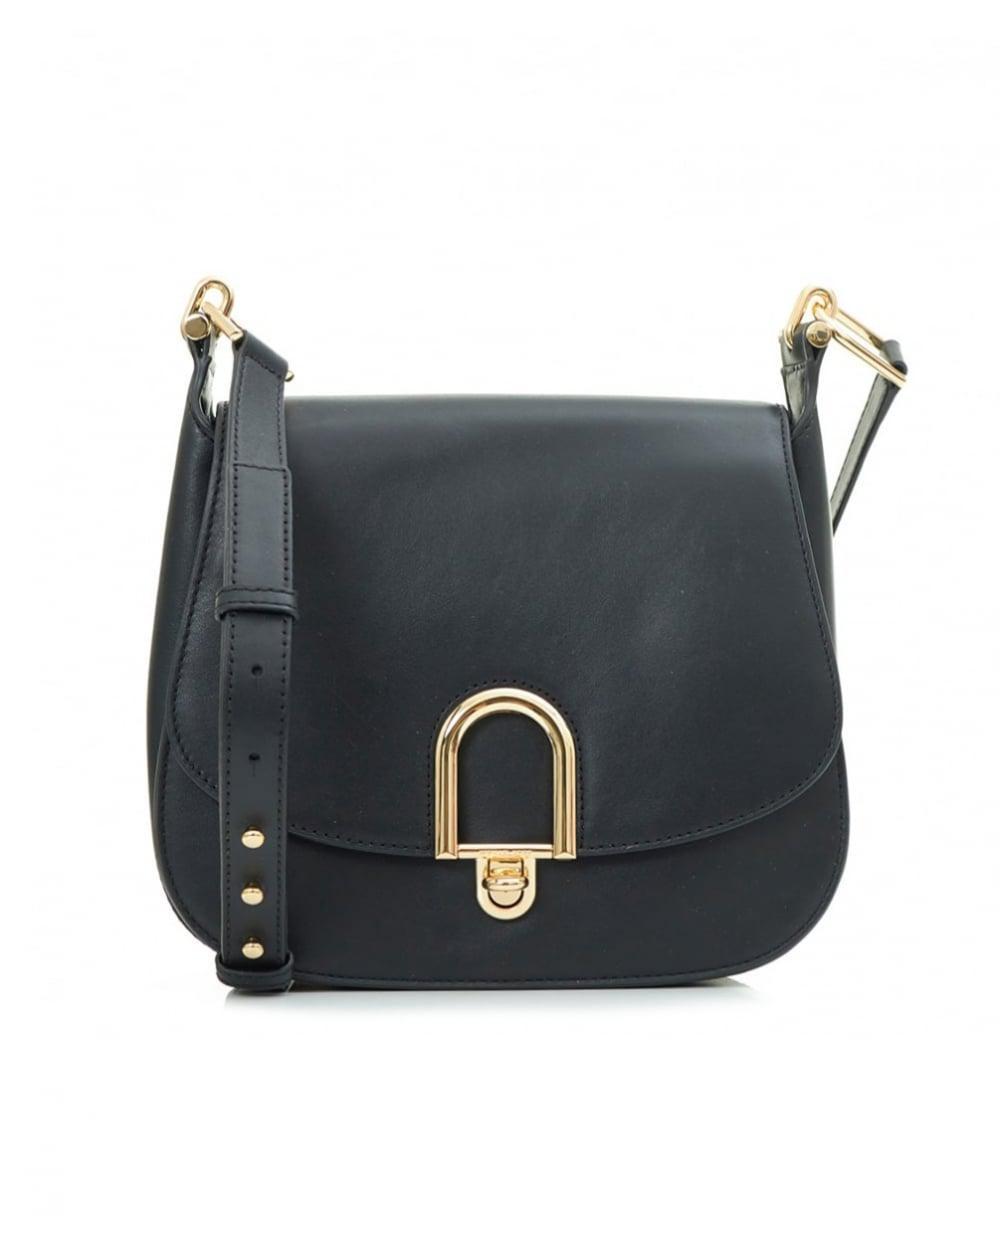 5df5632f2a80 Lyst - Michael Kors Delfina Large Leather Saddle Bag in Black